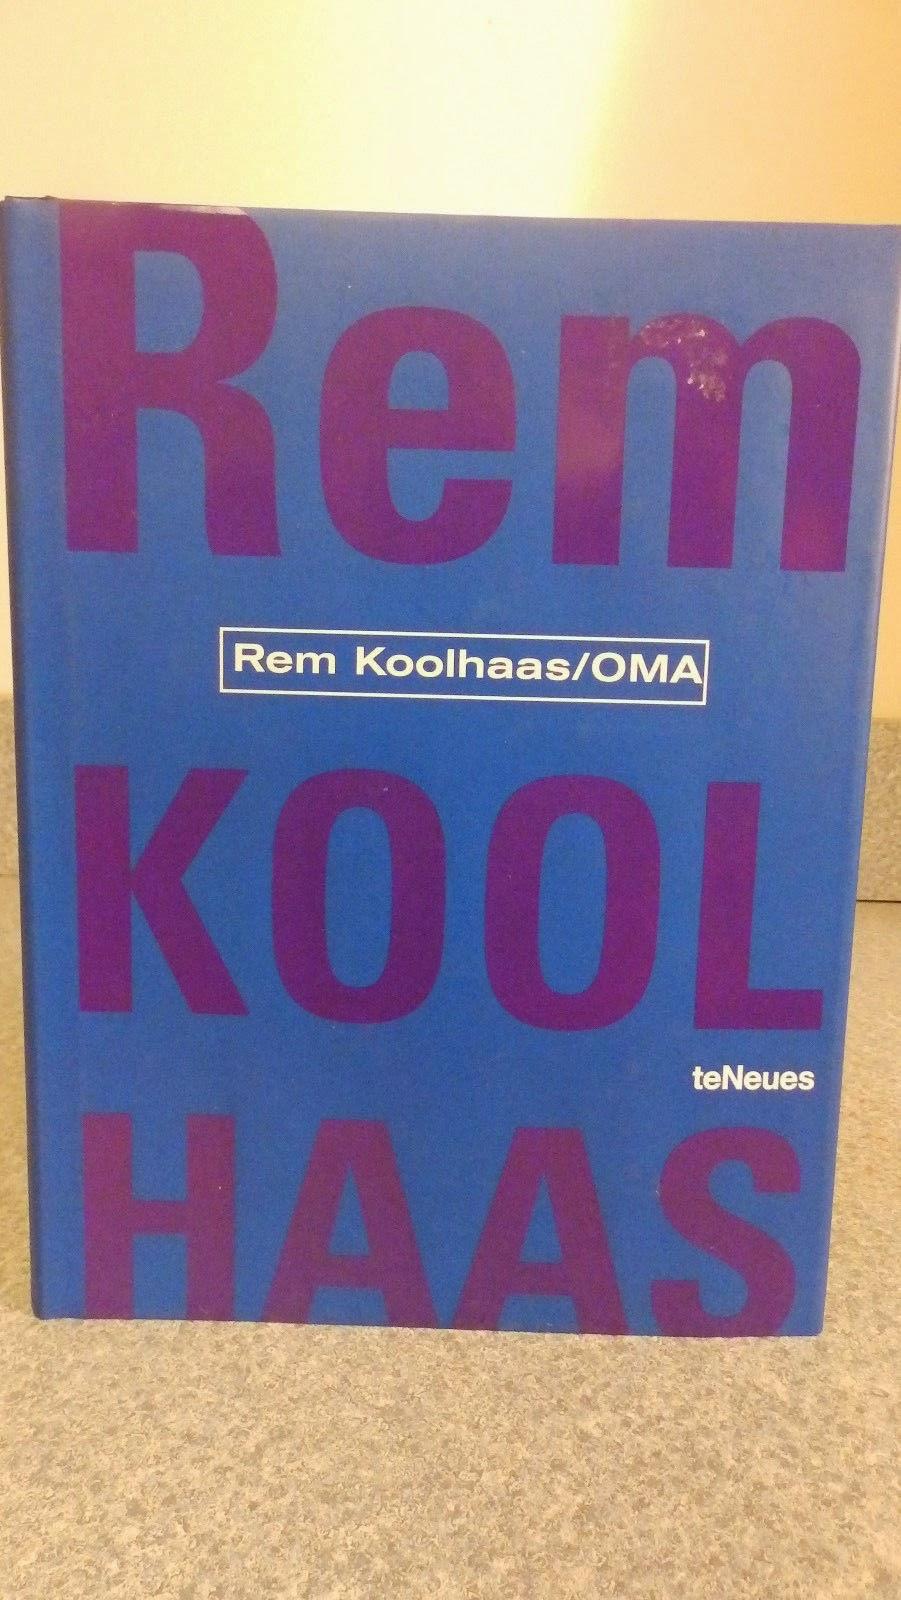 http://www.ebay.com/itm/Rem-Koolhaas-OMA-hardcover-book-Architecture-English-German-Italian-French-/321689700552?pt=LH_DefaultDomain_0&hash=item4ae63348c8